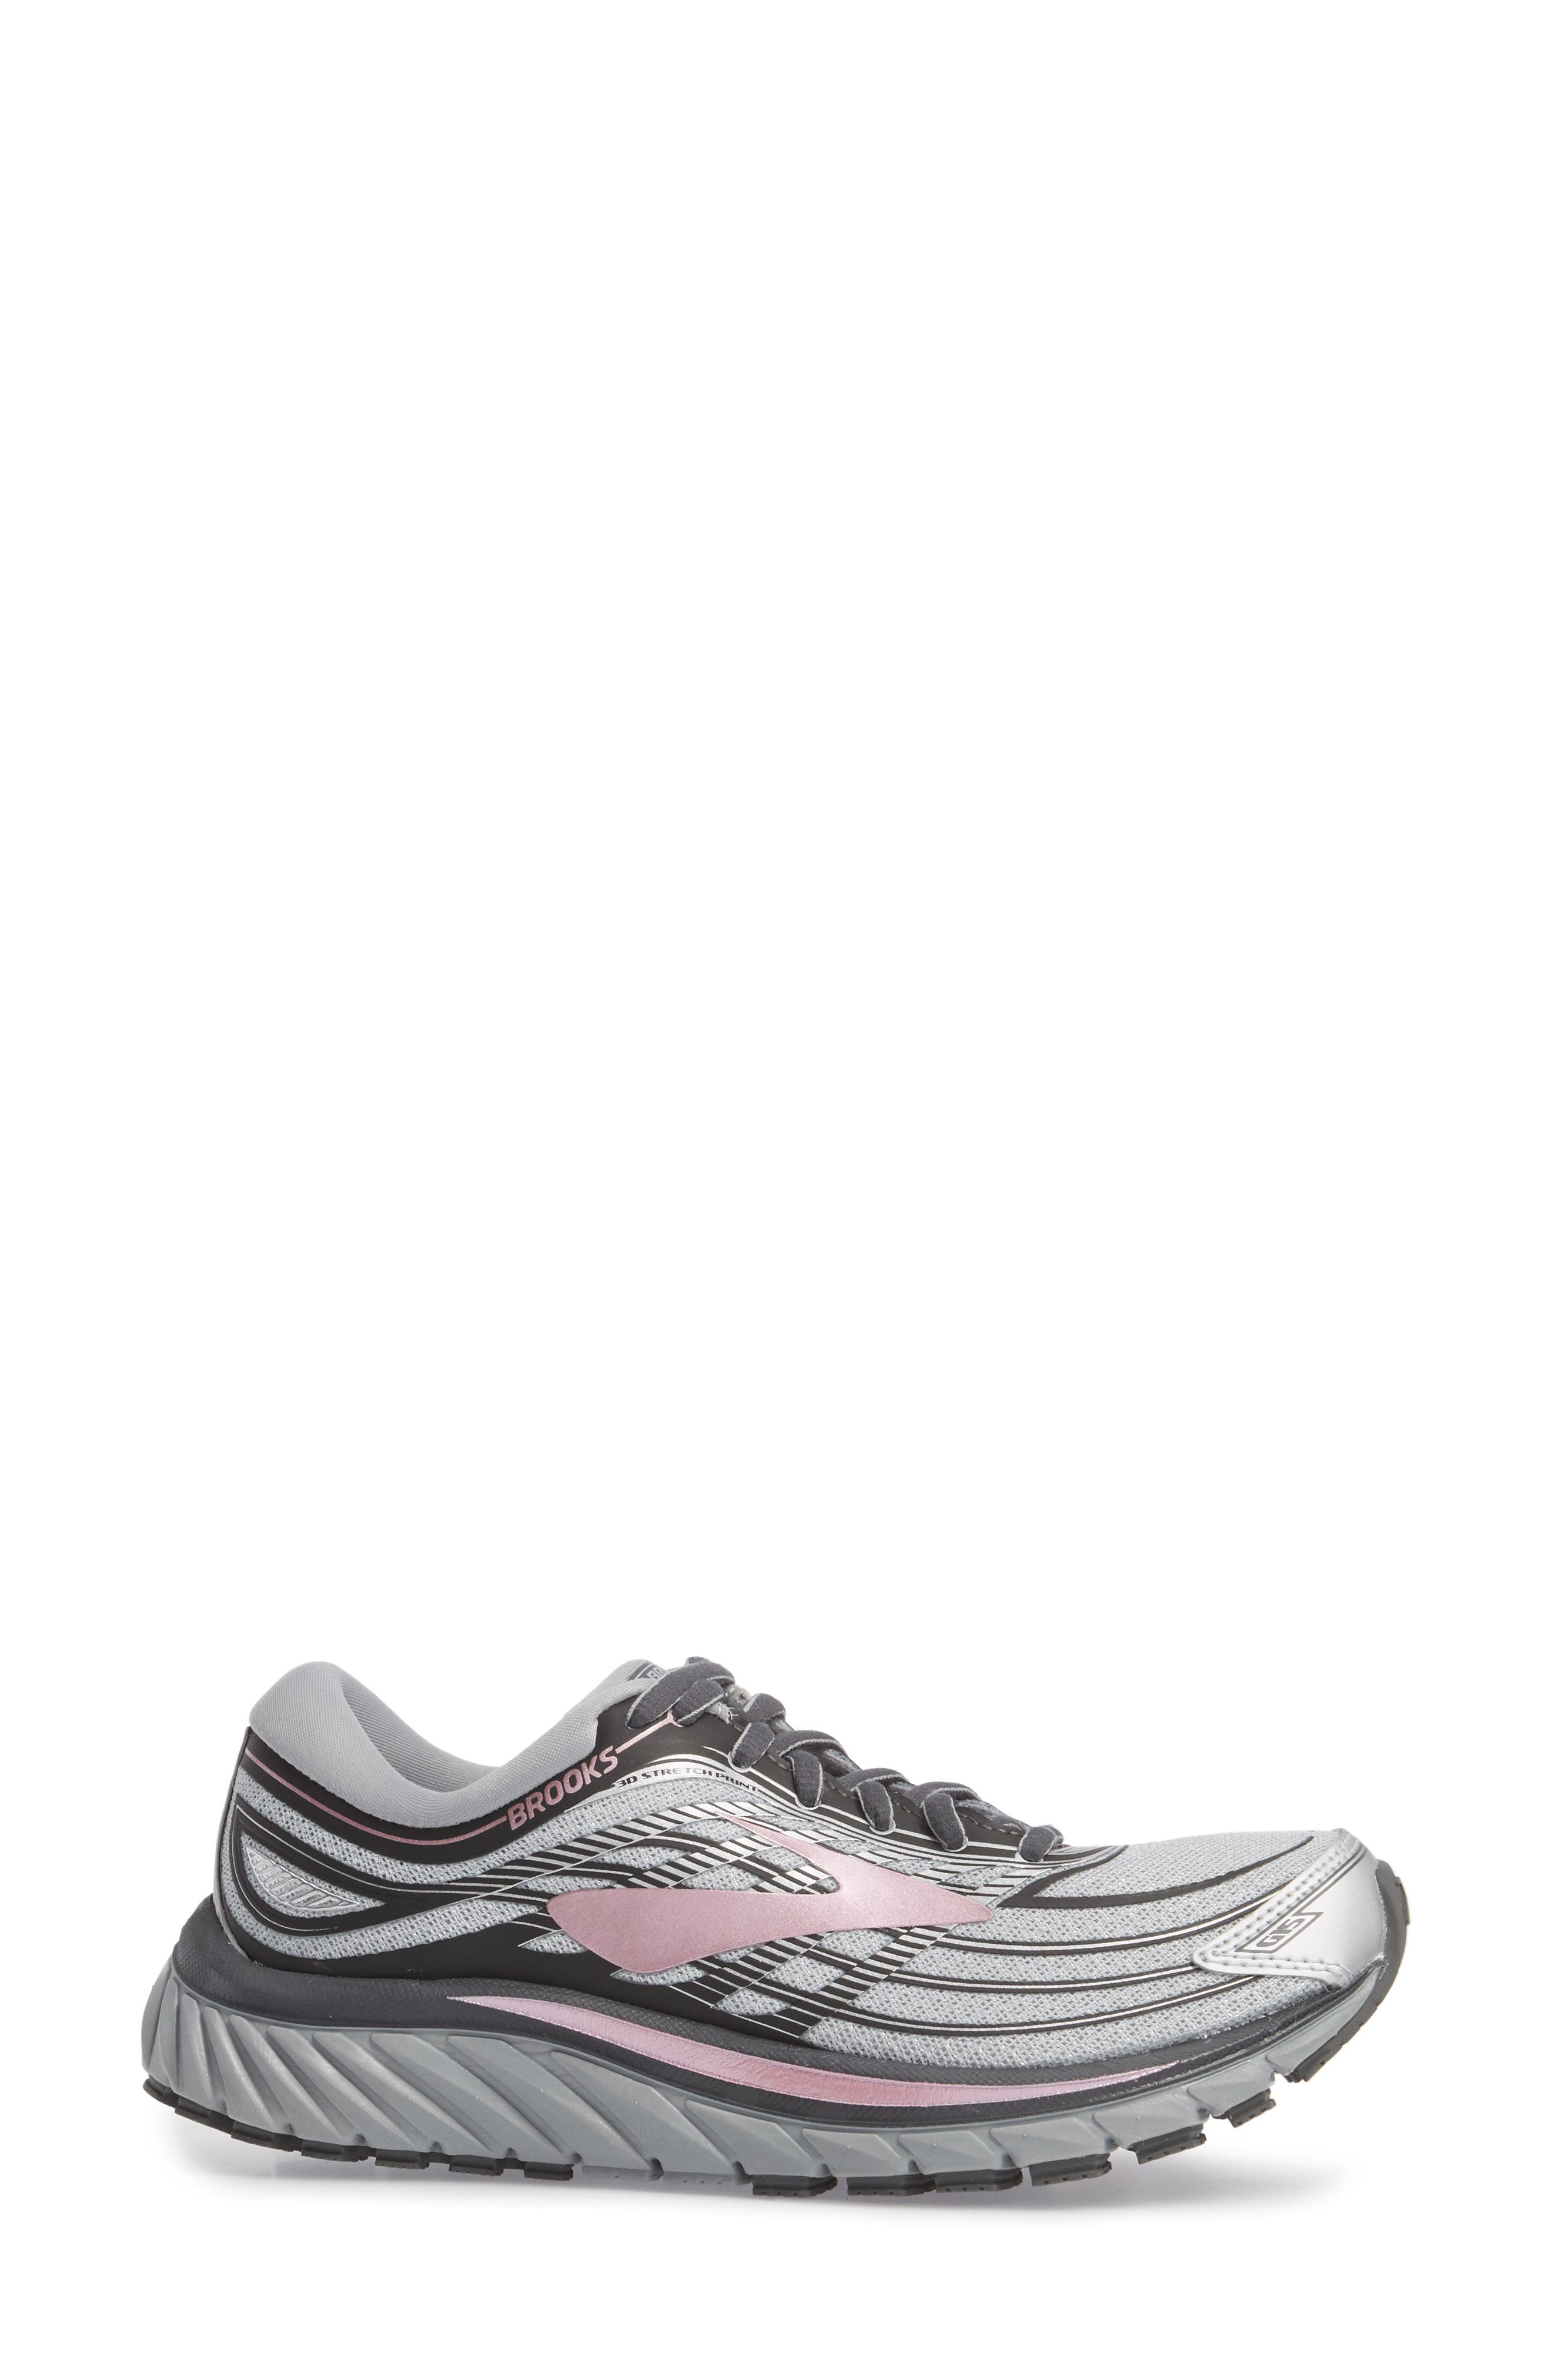 Glycerin 15 Running Shoe,                             Alternate thumbnail 3, color,                             057